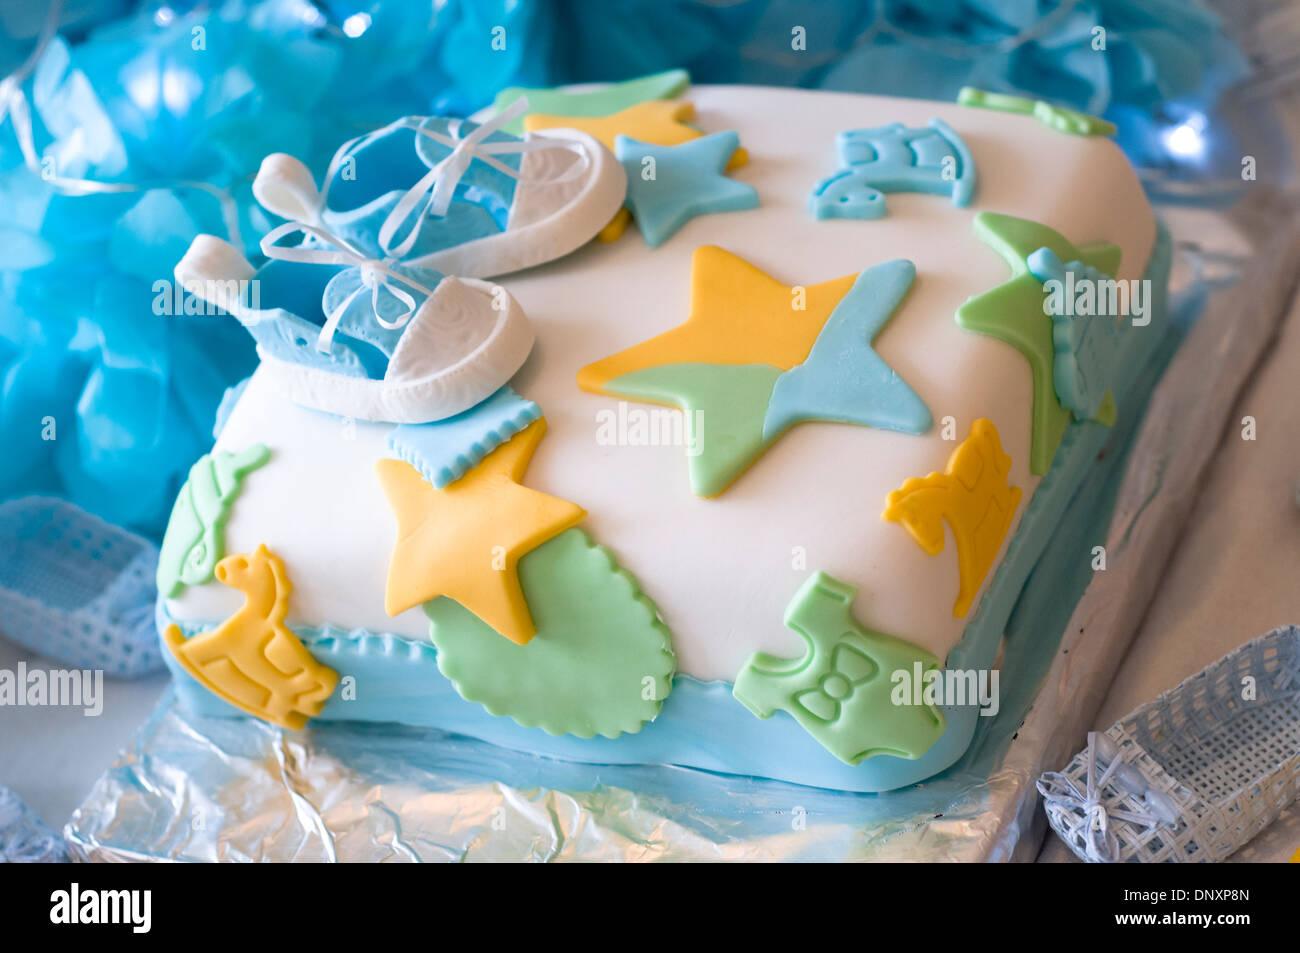 Baby shower cake - Stock Image